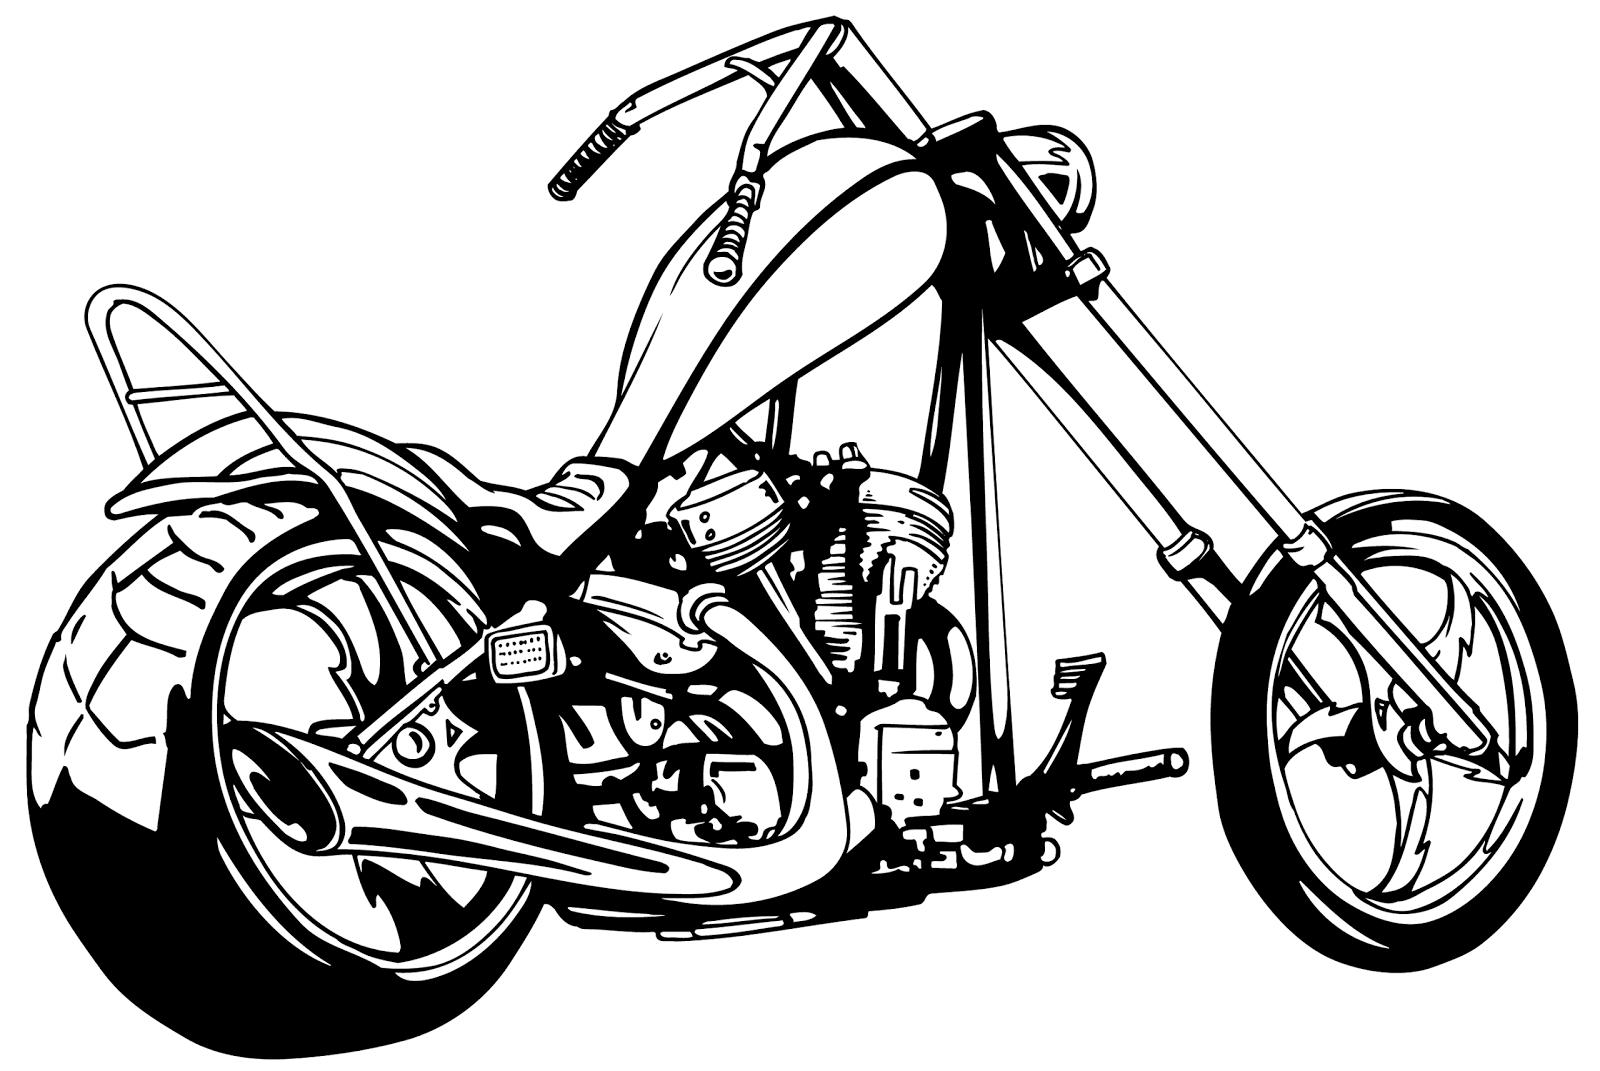 Harley Davidson Clip Art: Free Harley Cliparts, Download Free Clip Art, Free Clip